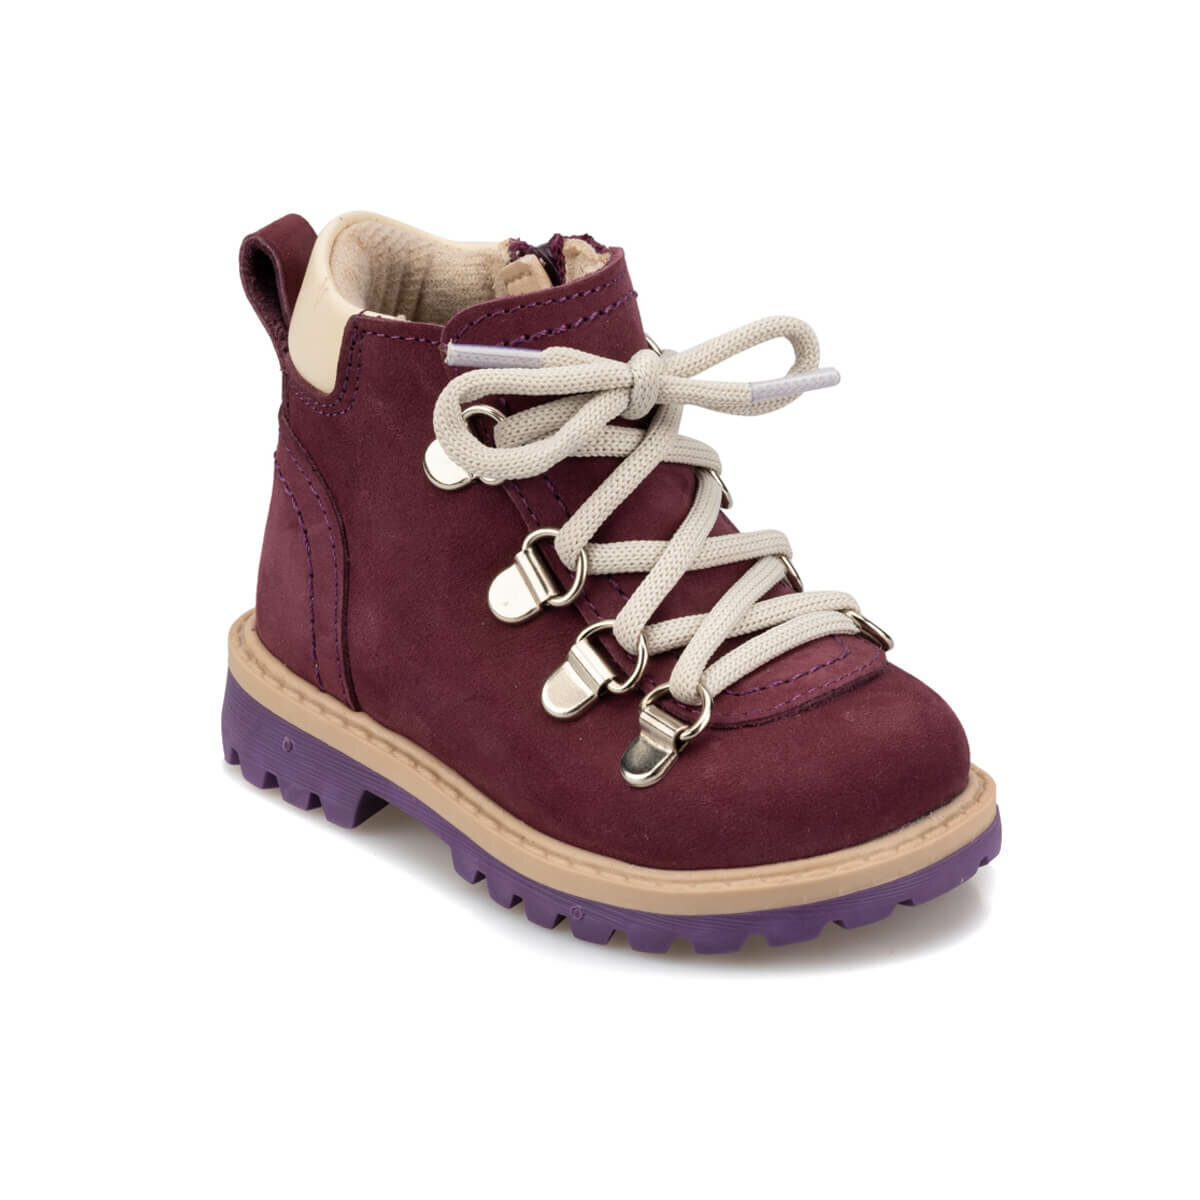 FLO 92.511746.I Purple Female Child Boots Polaris